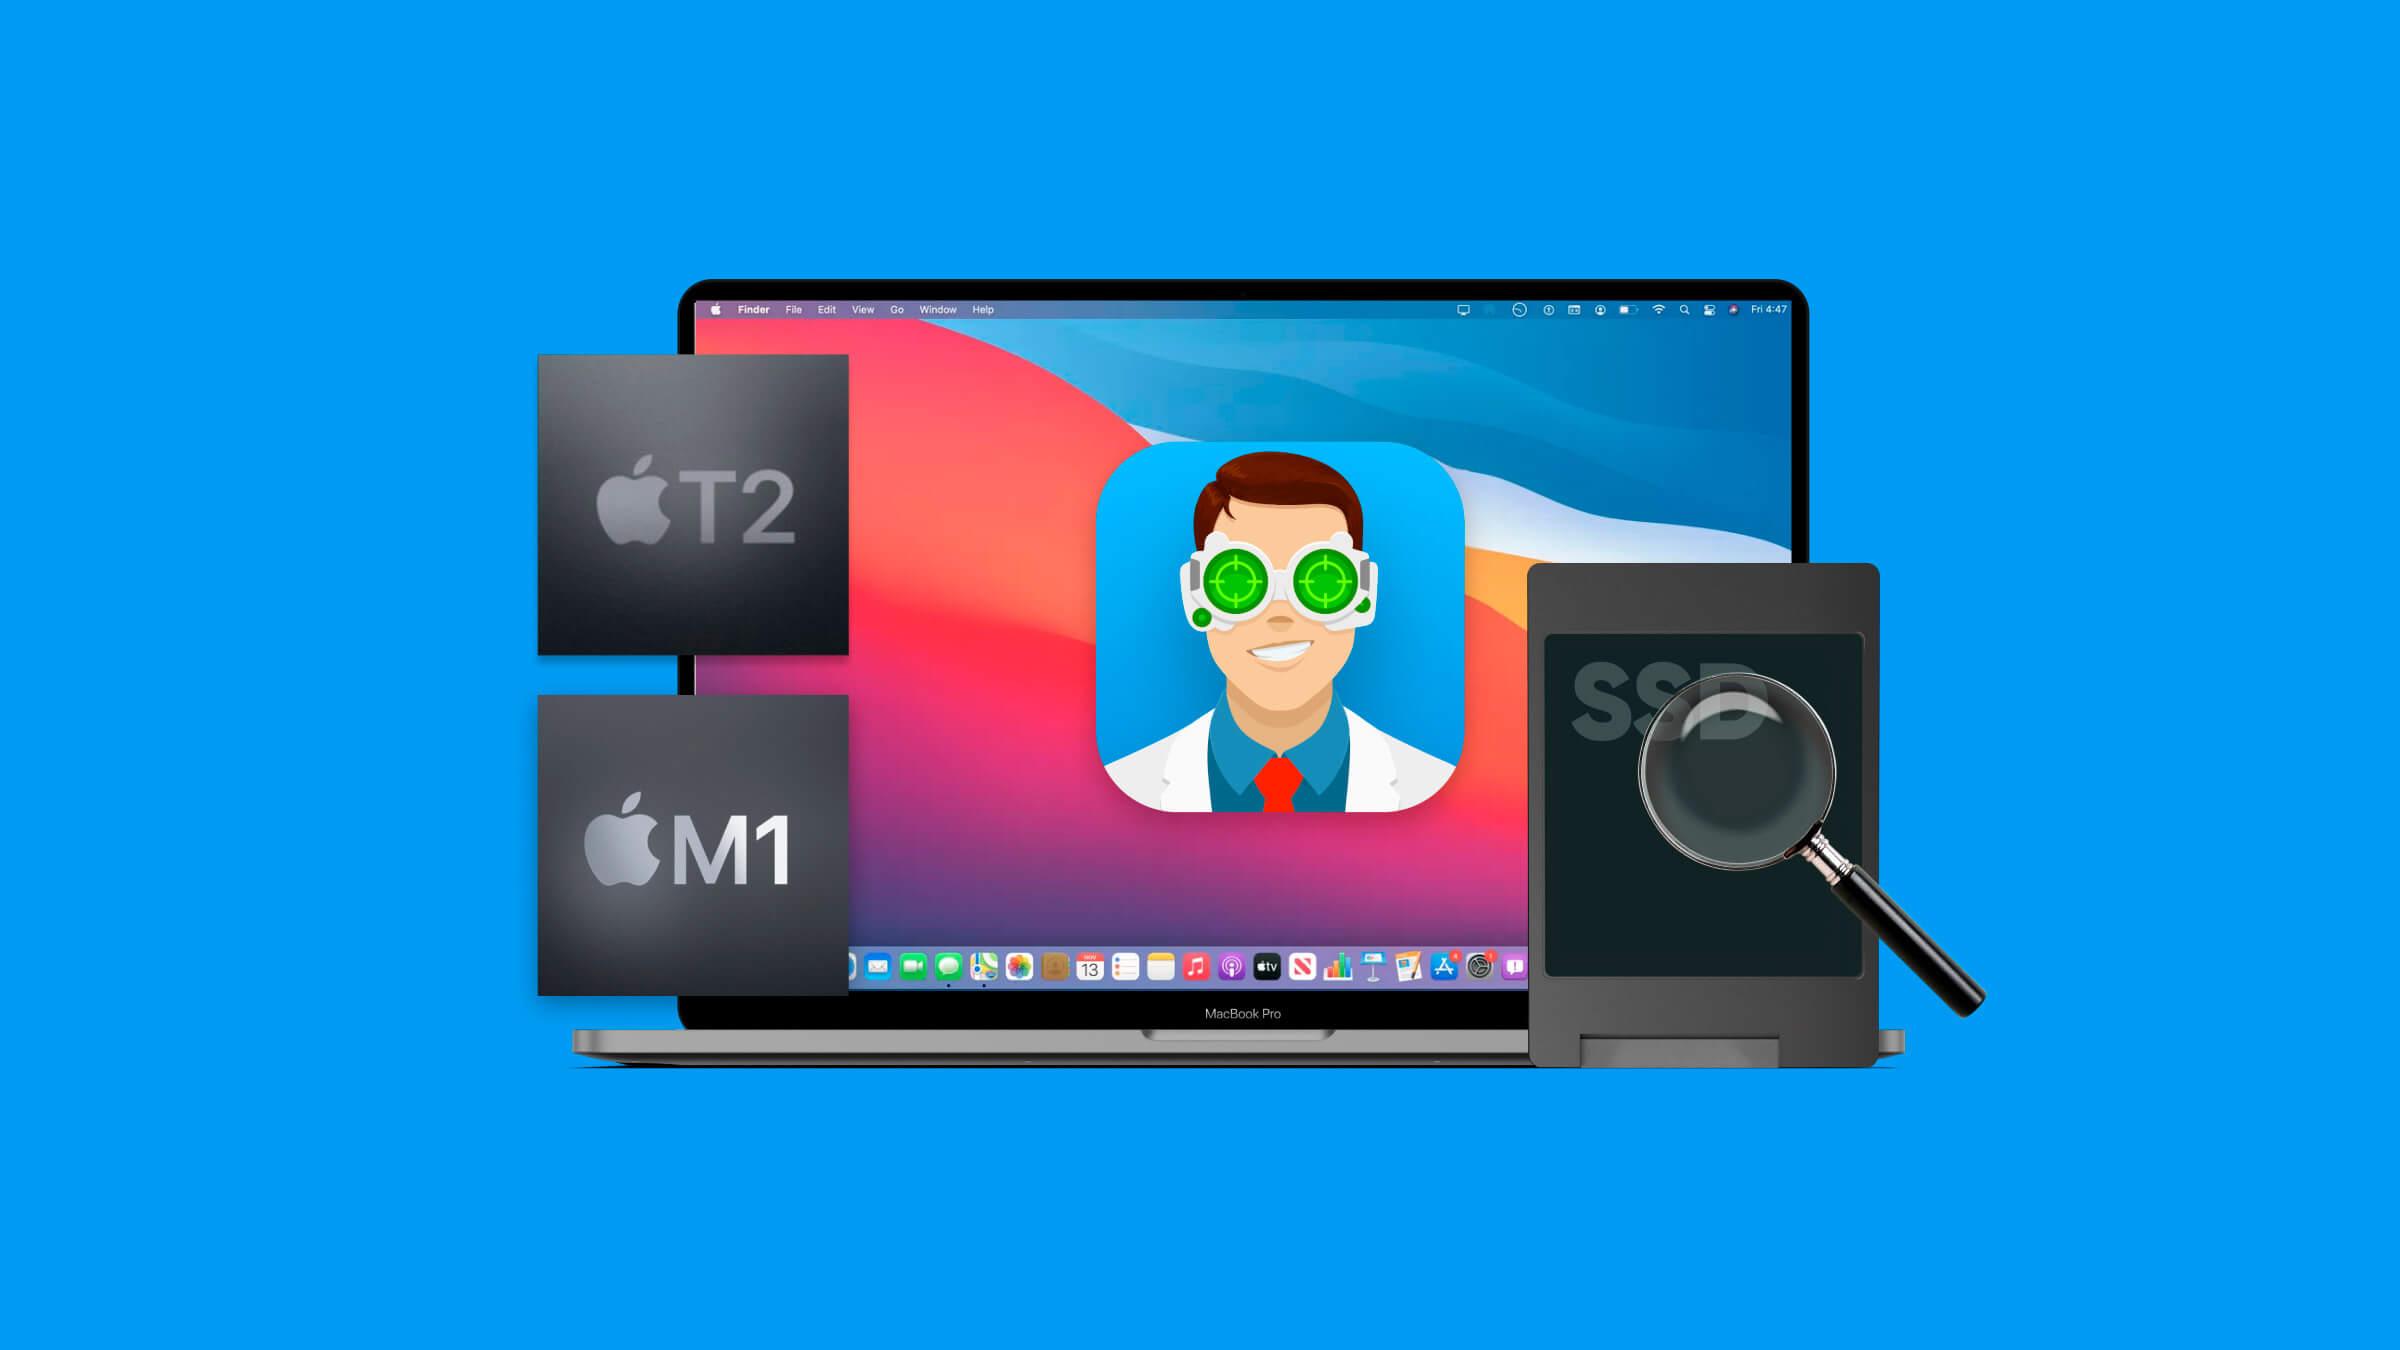 Disk Drill M1 Macs Support